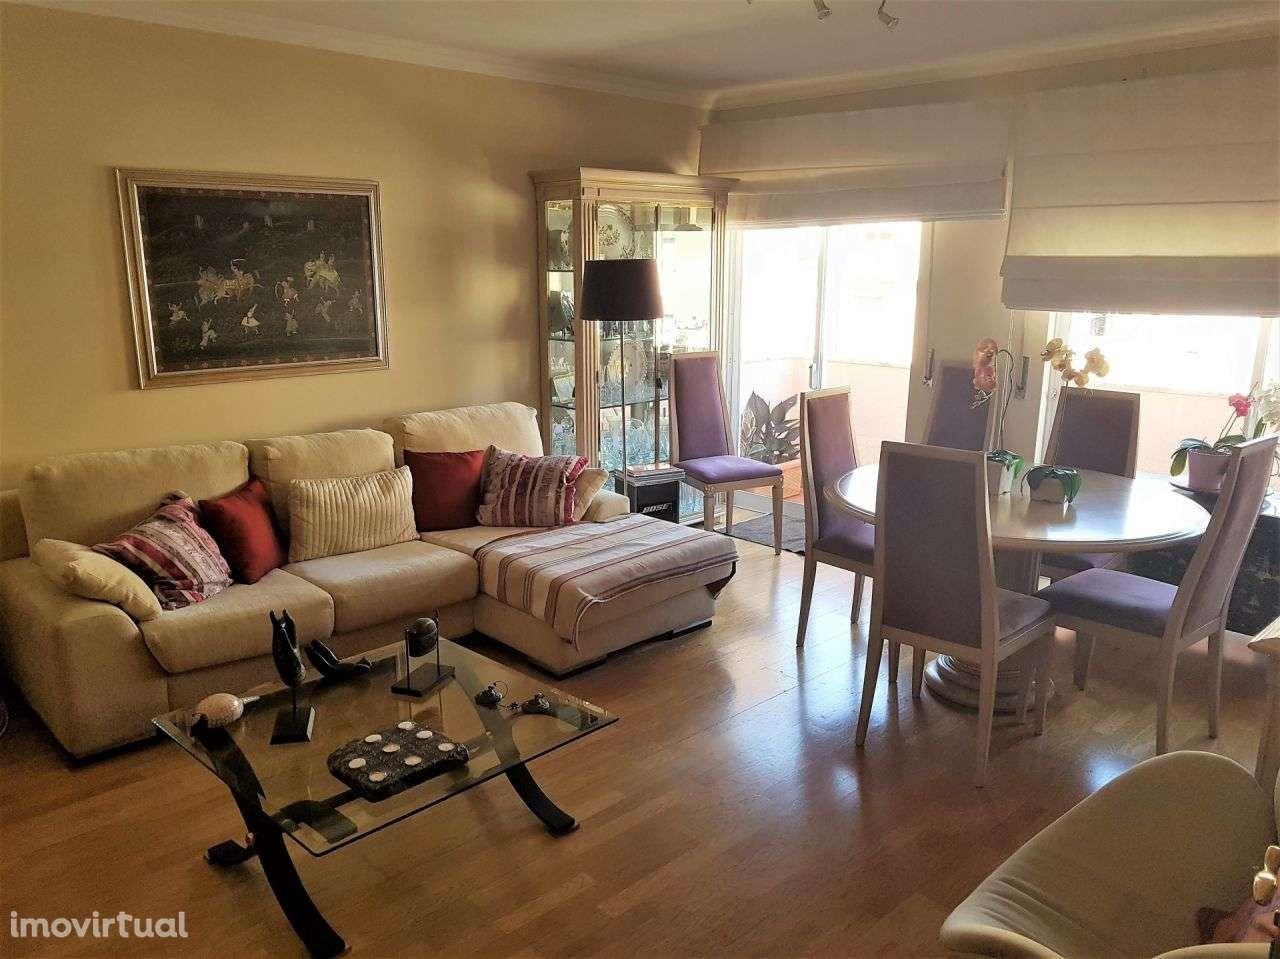 Apartamento para comprar, Rio de Mouro, Lisboa - Foto 1